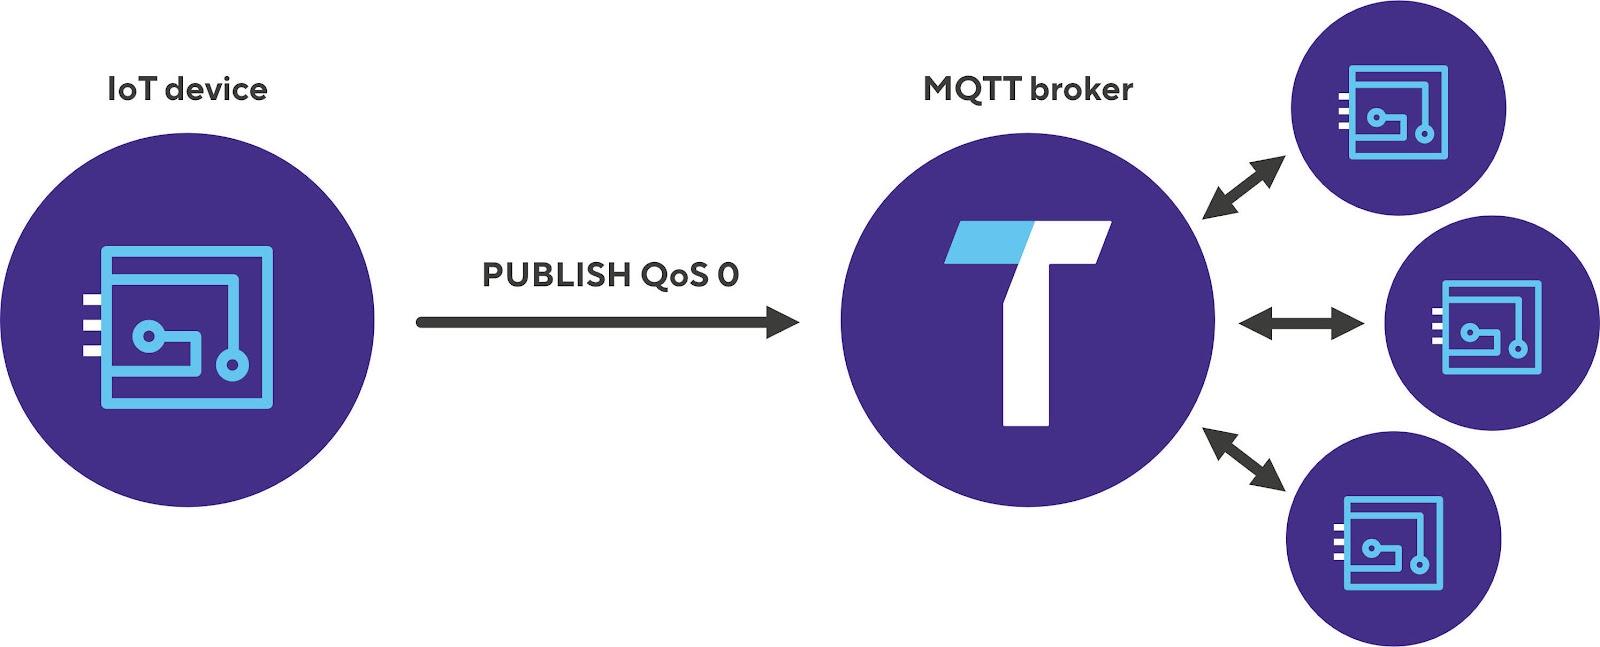 MQTT QoS 0